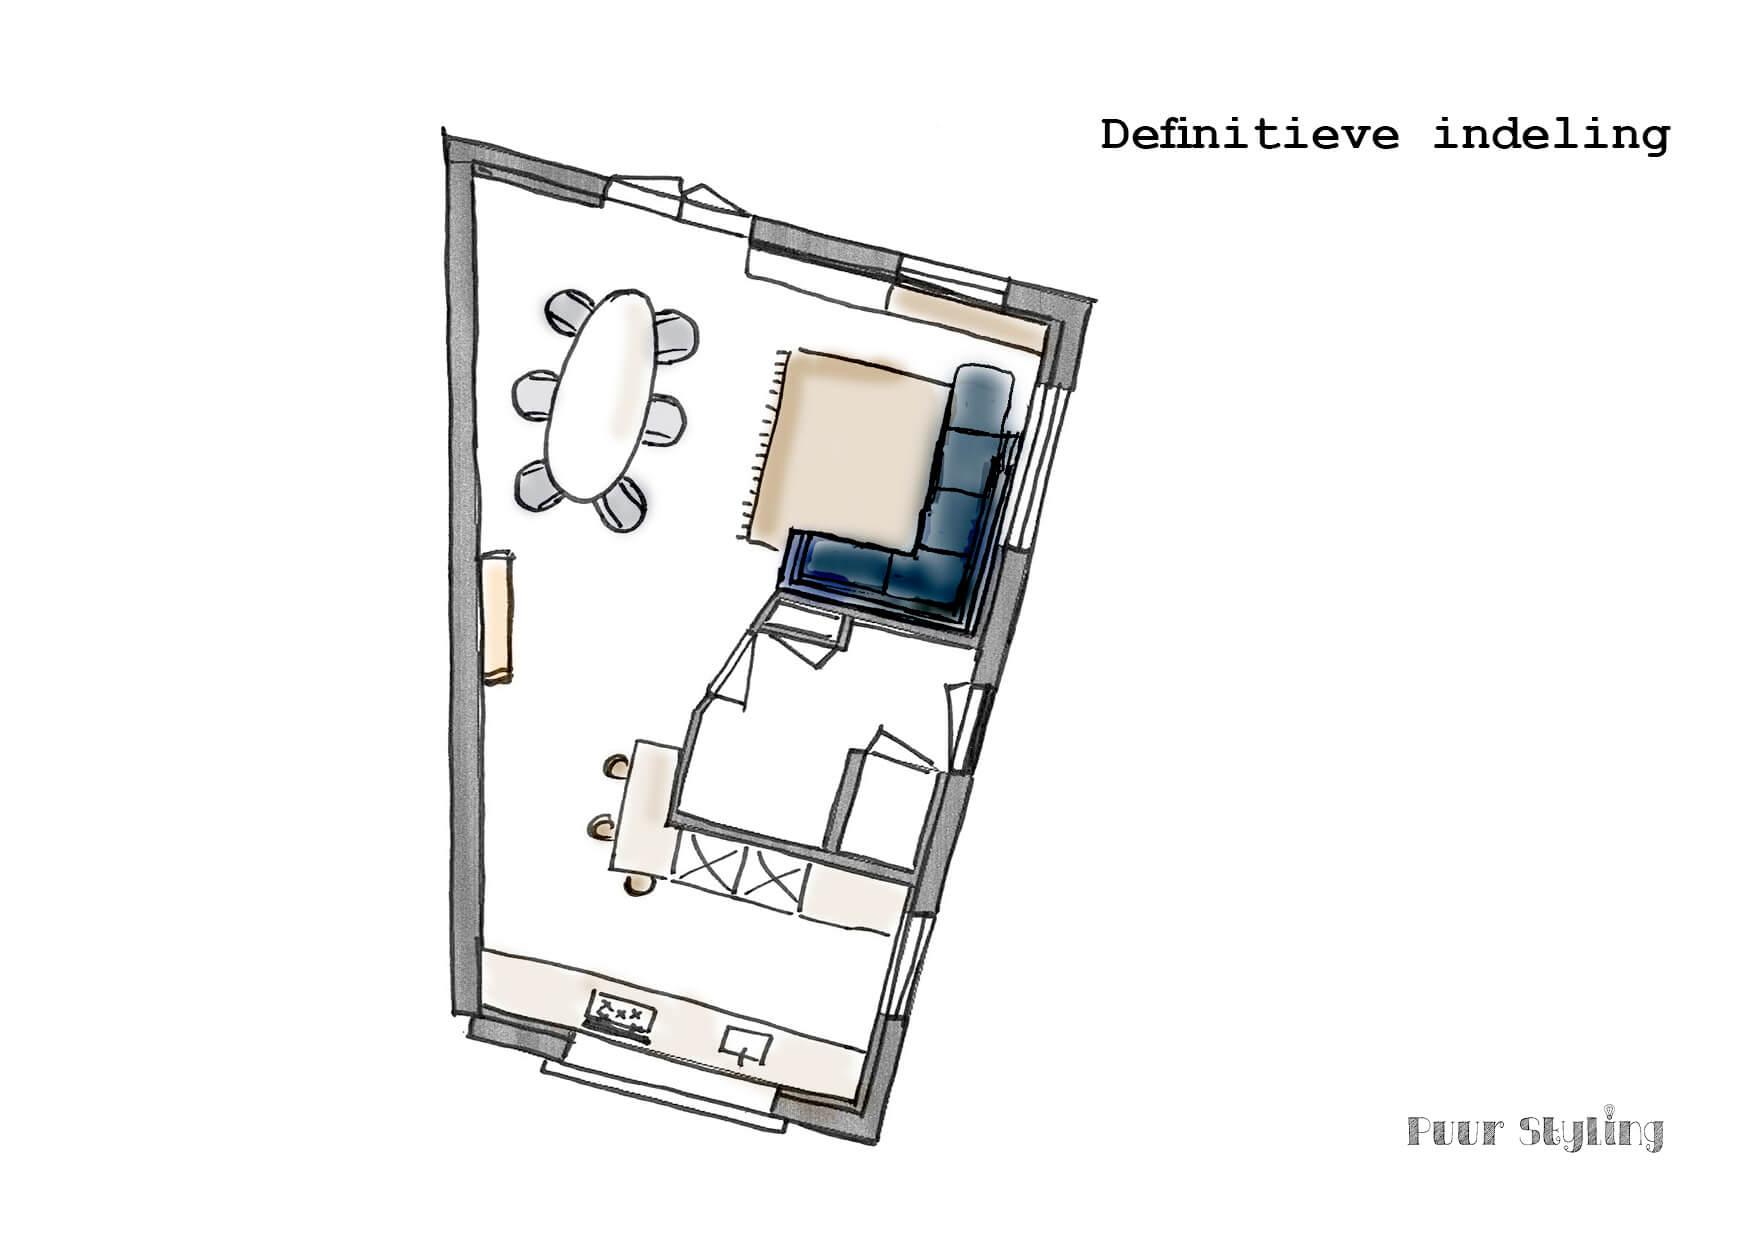 puur styling interieuradvies blauw plattegrond